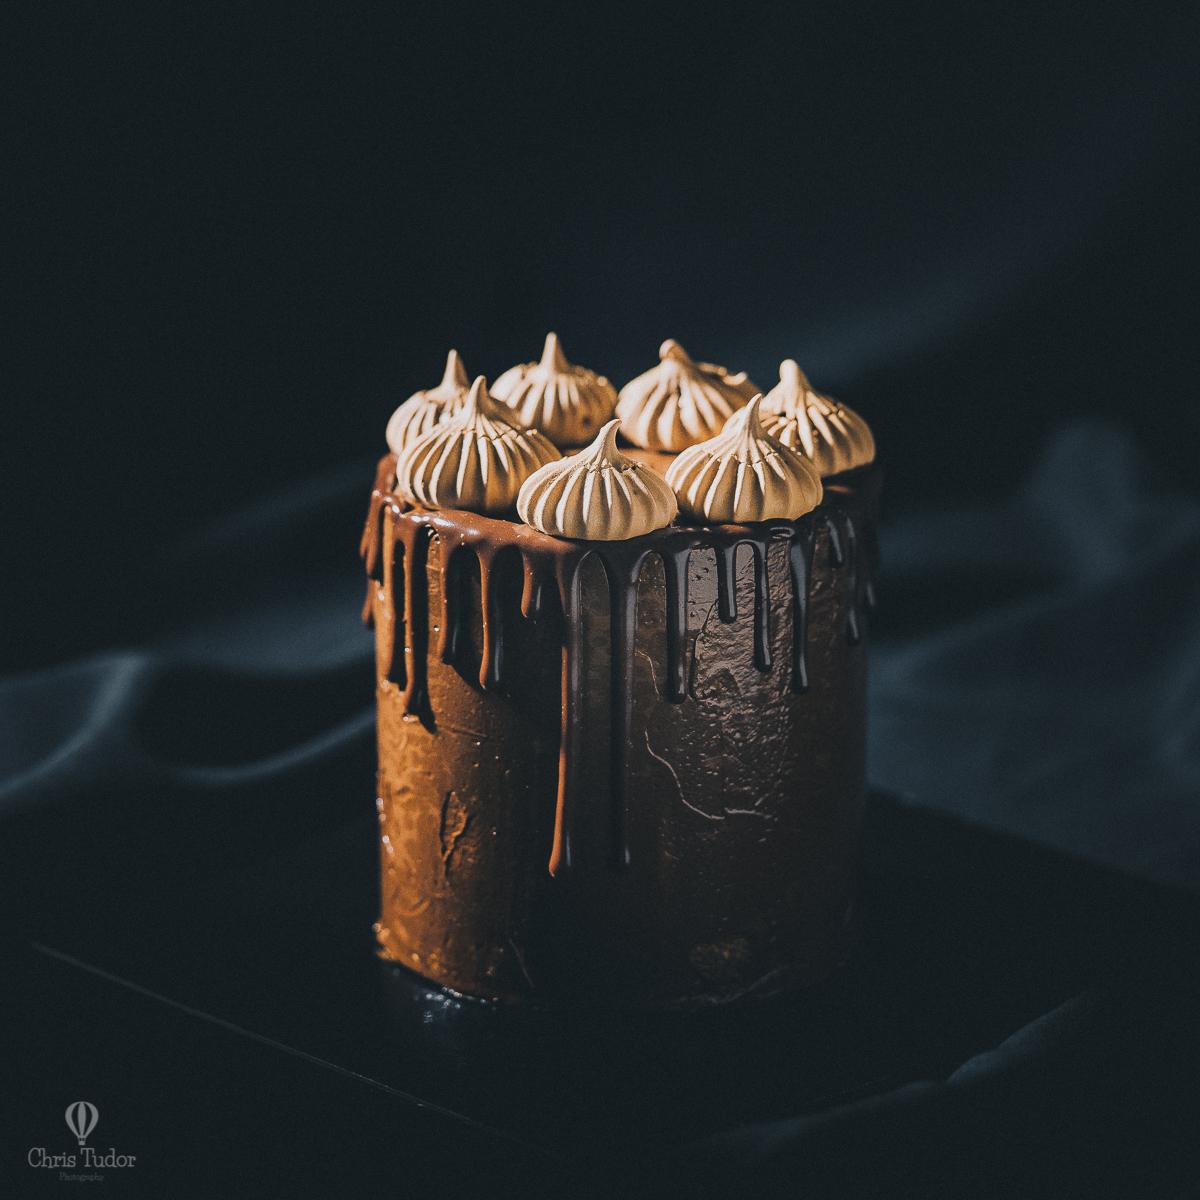 cristina-tudor-food-photography (44).jpg